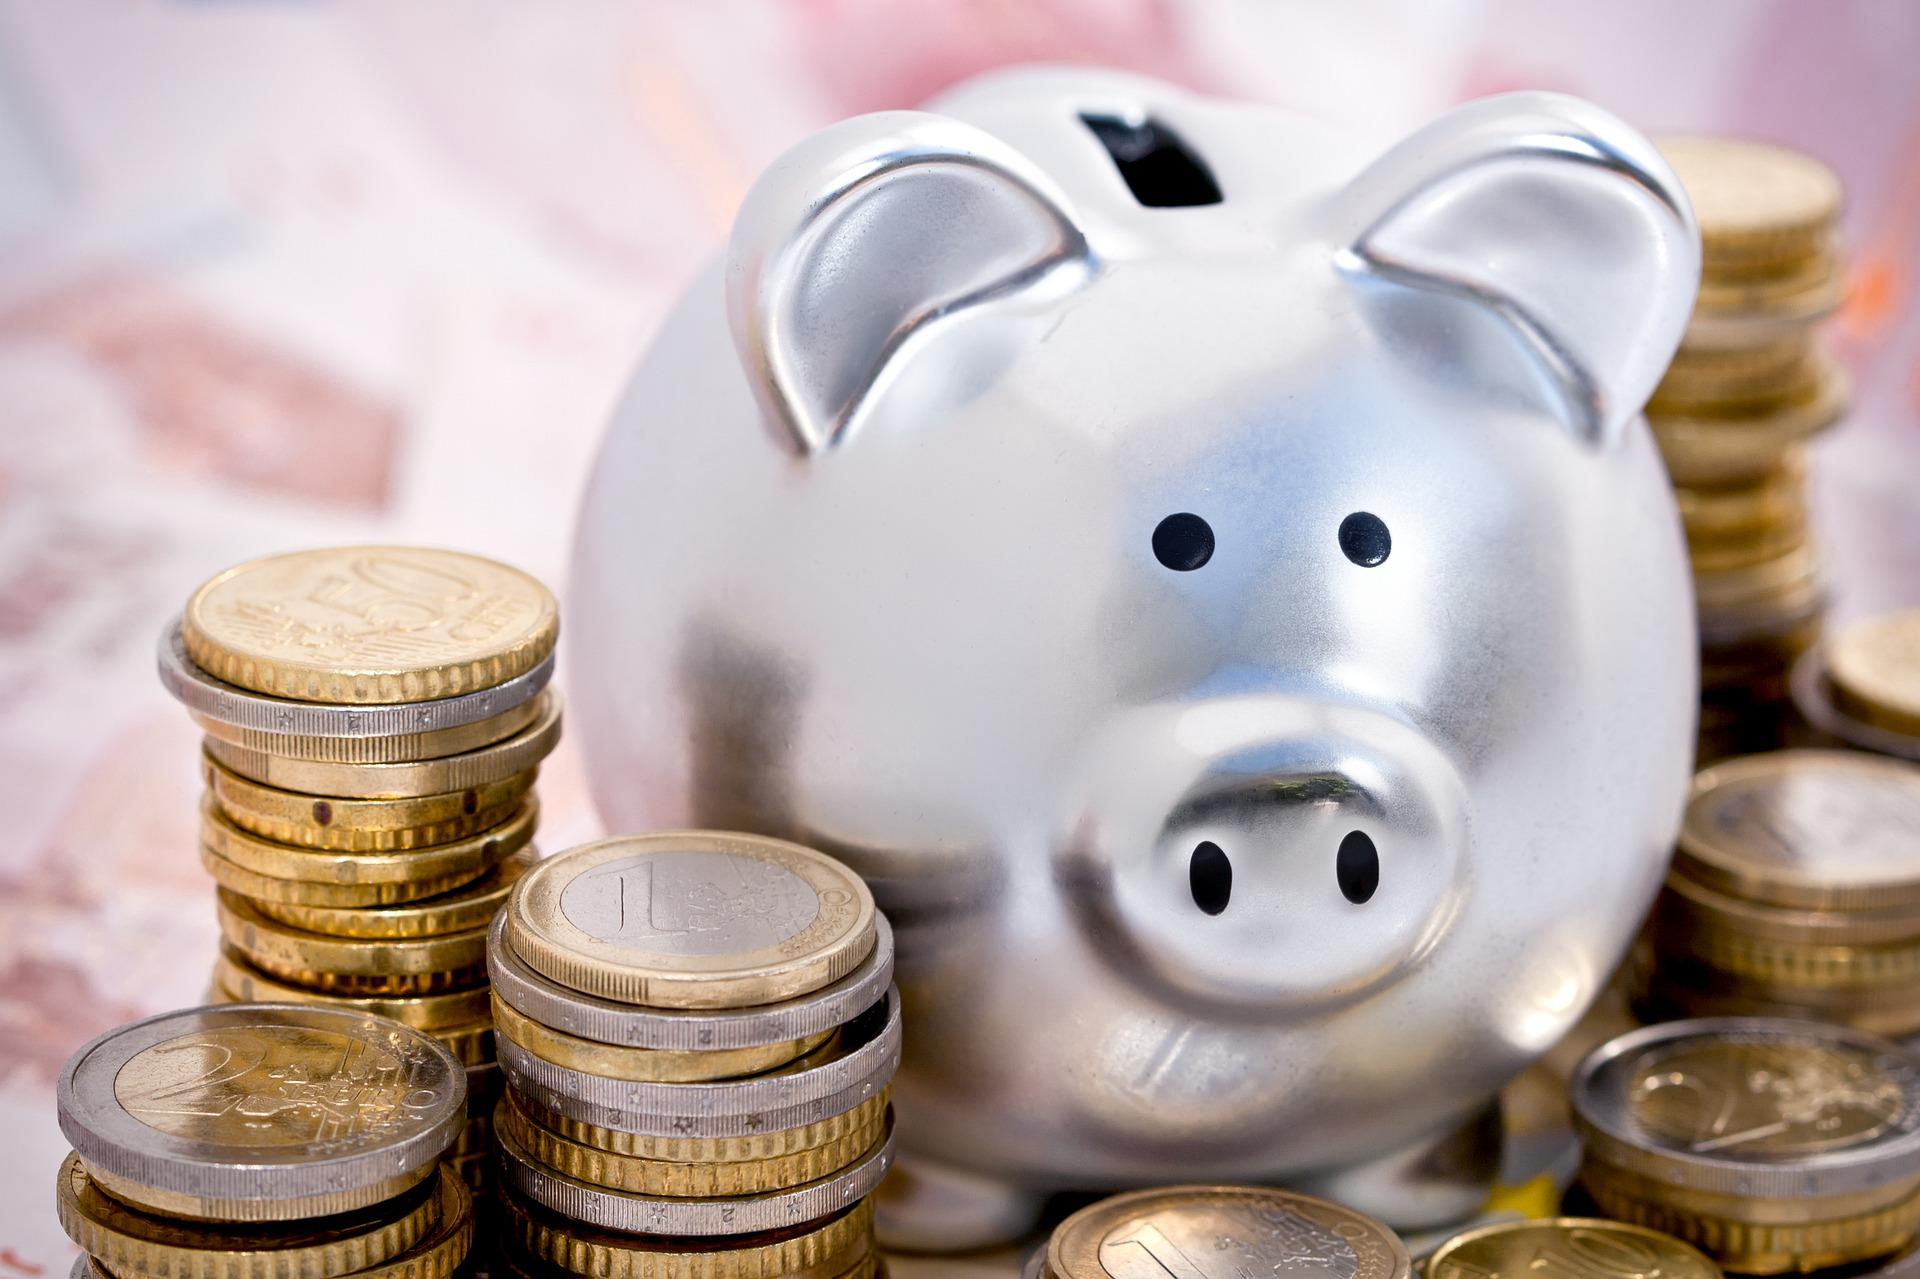 Epargne-placer son argent